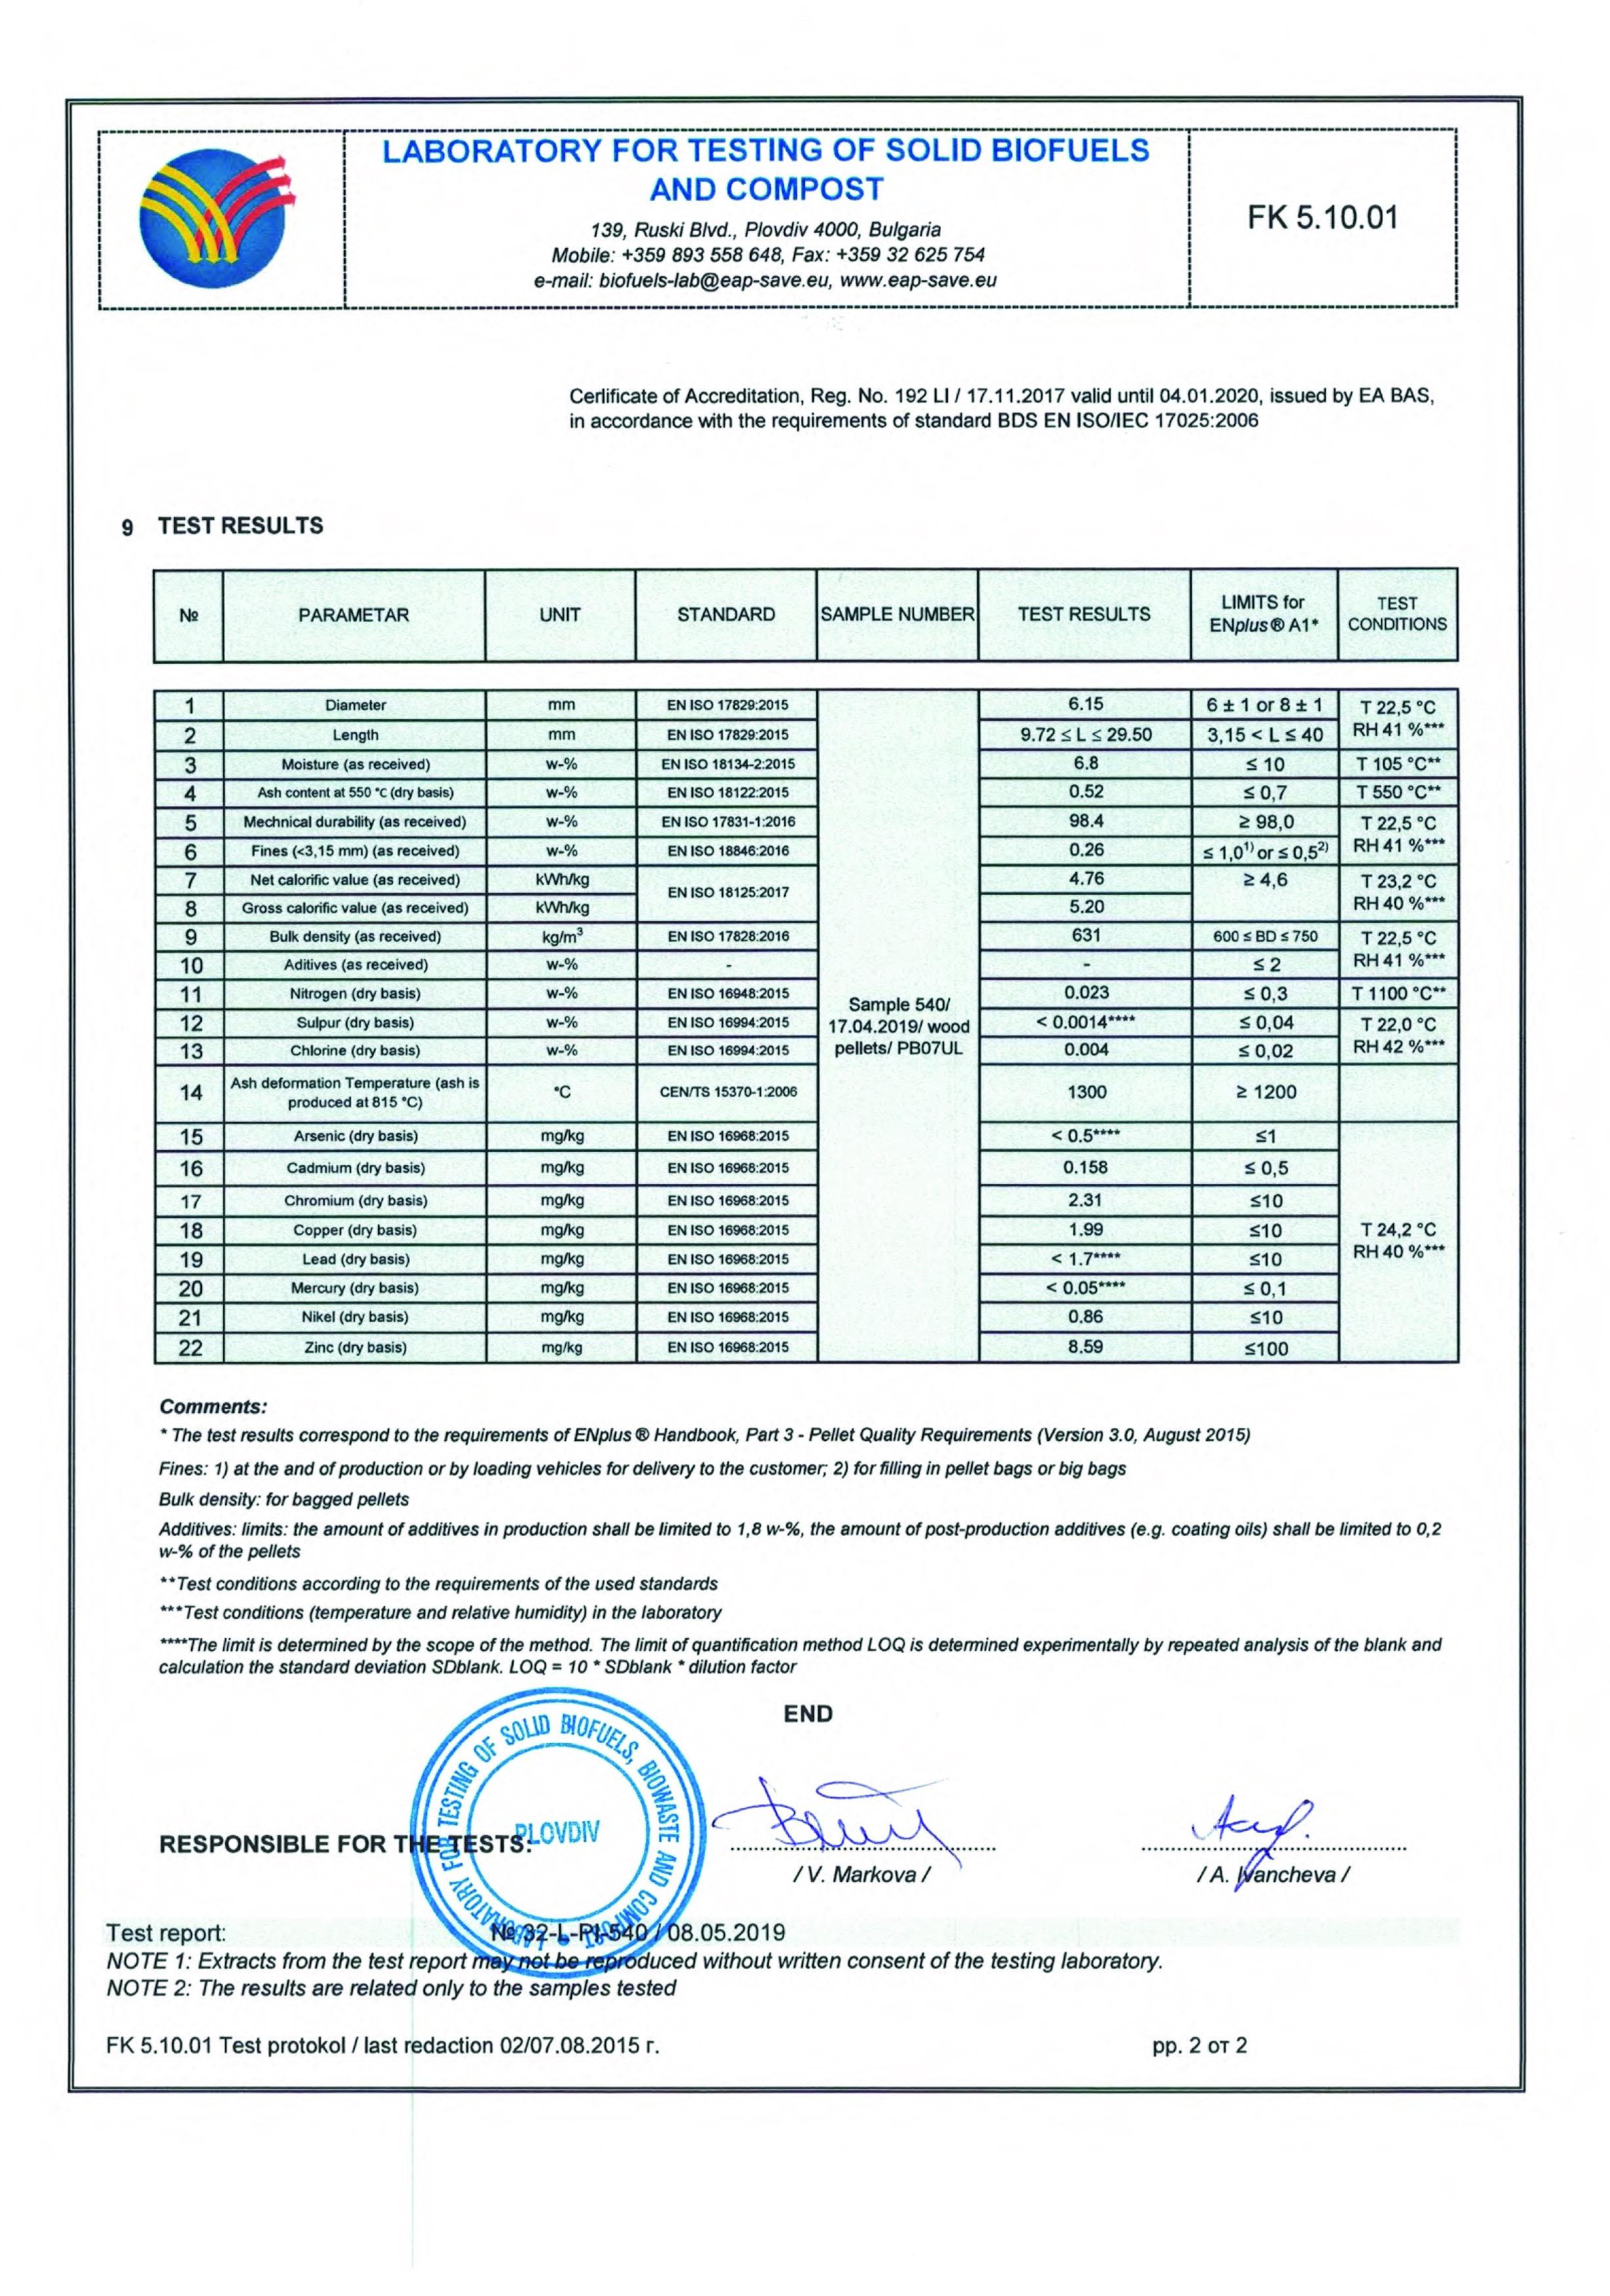 Test report sample 540 PB07UL scan 2